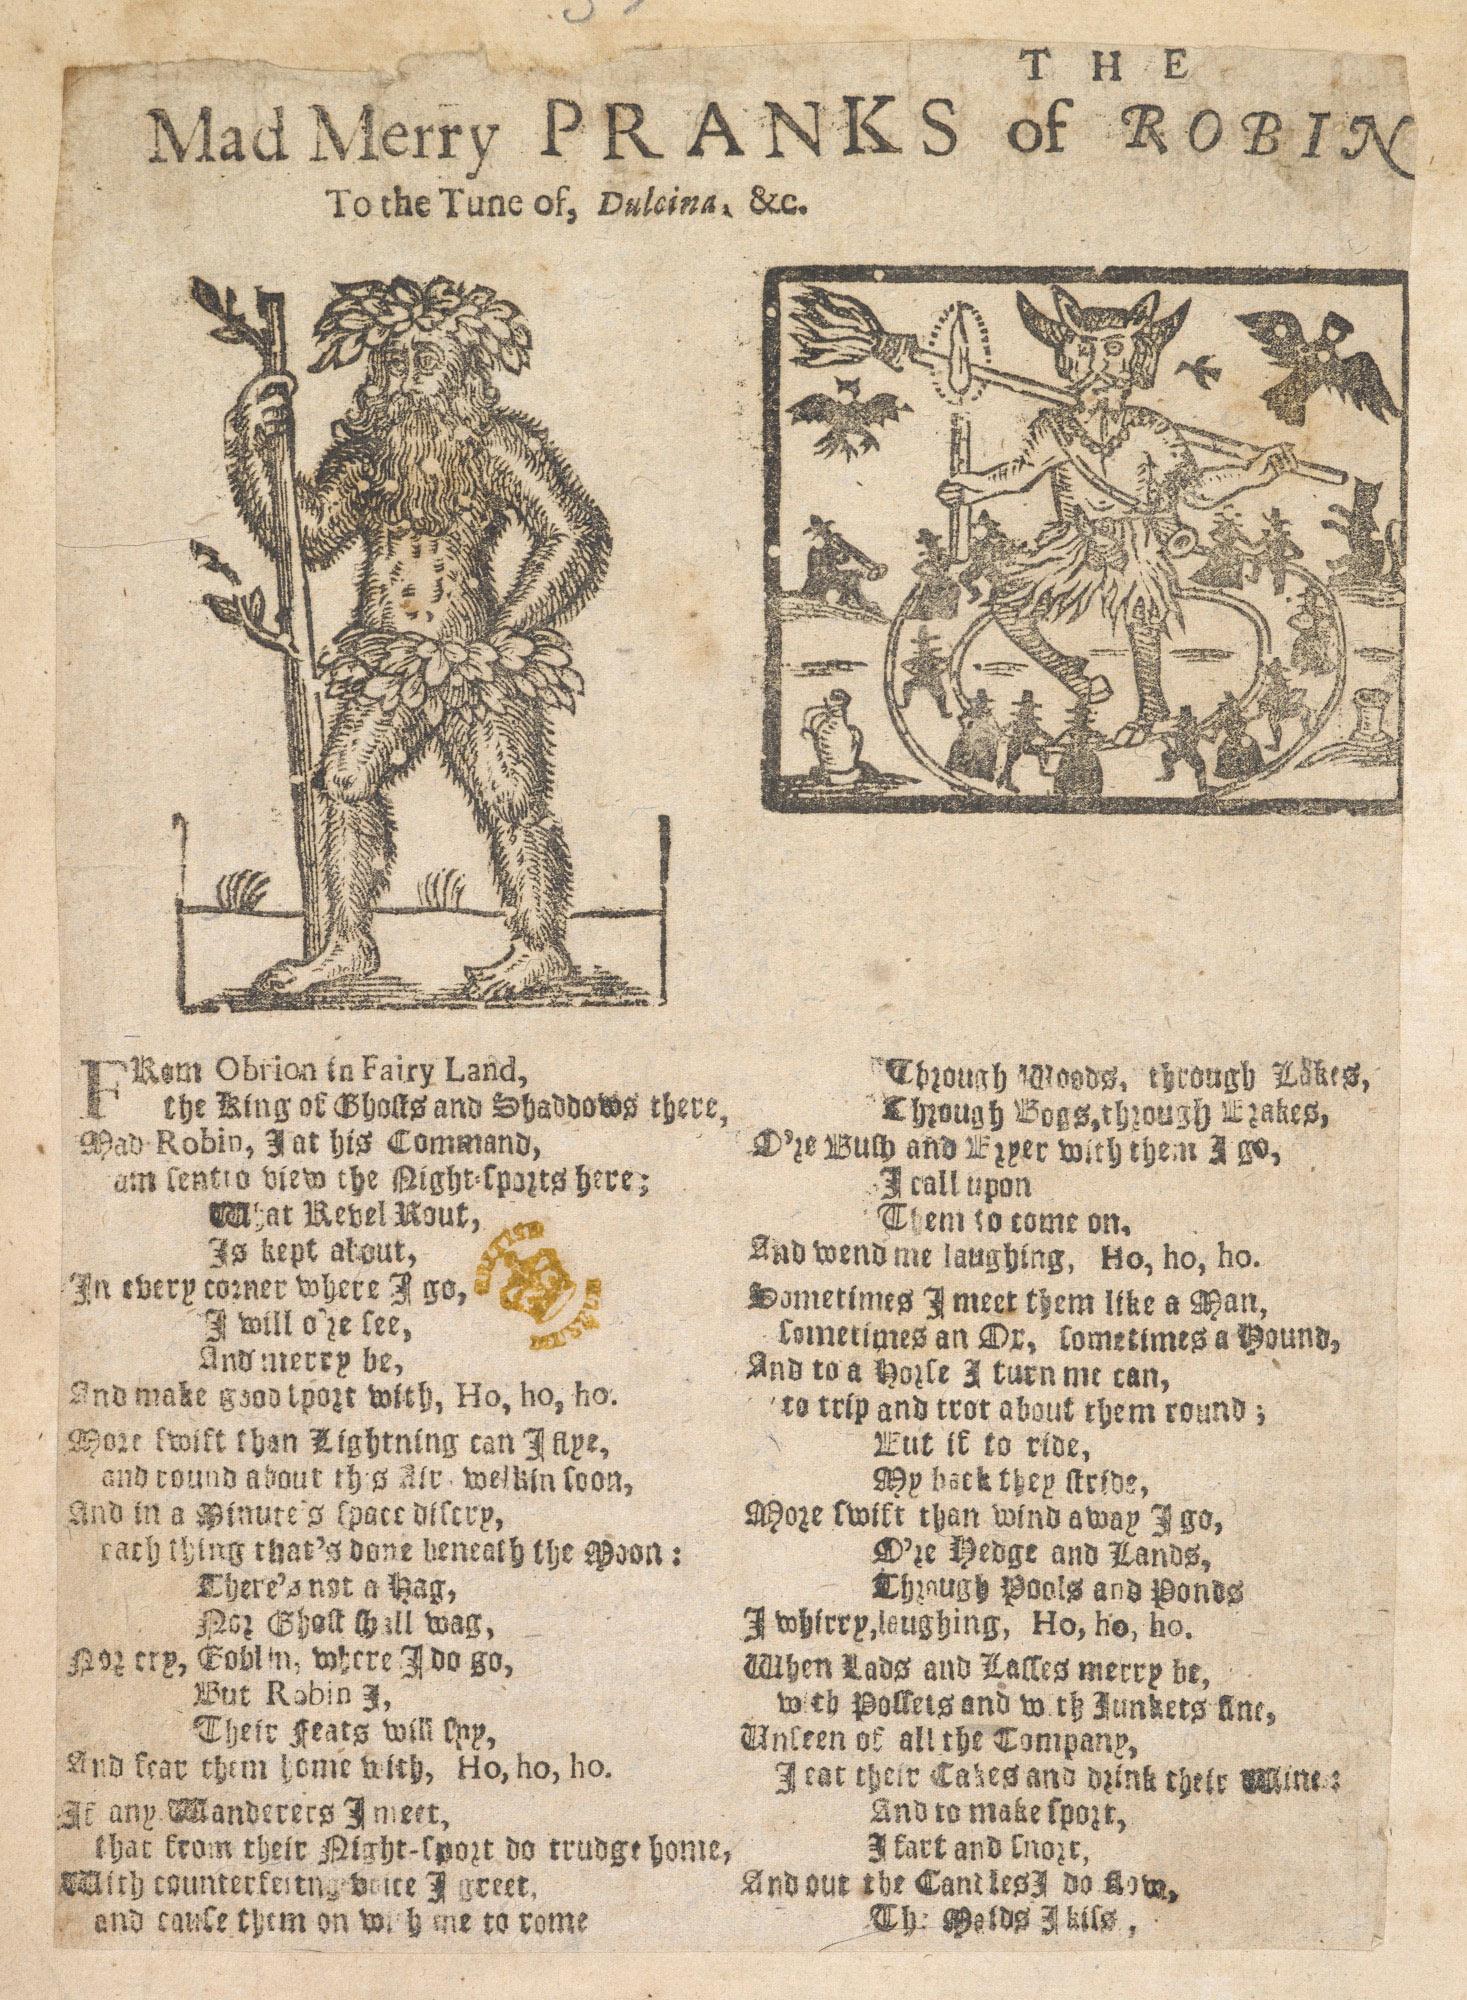 Broadside ballad on Robin Goodfellow